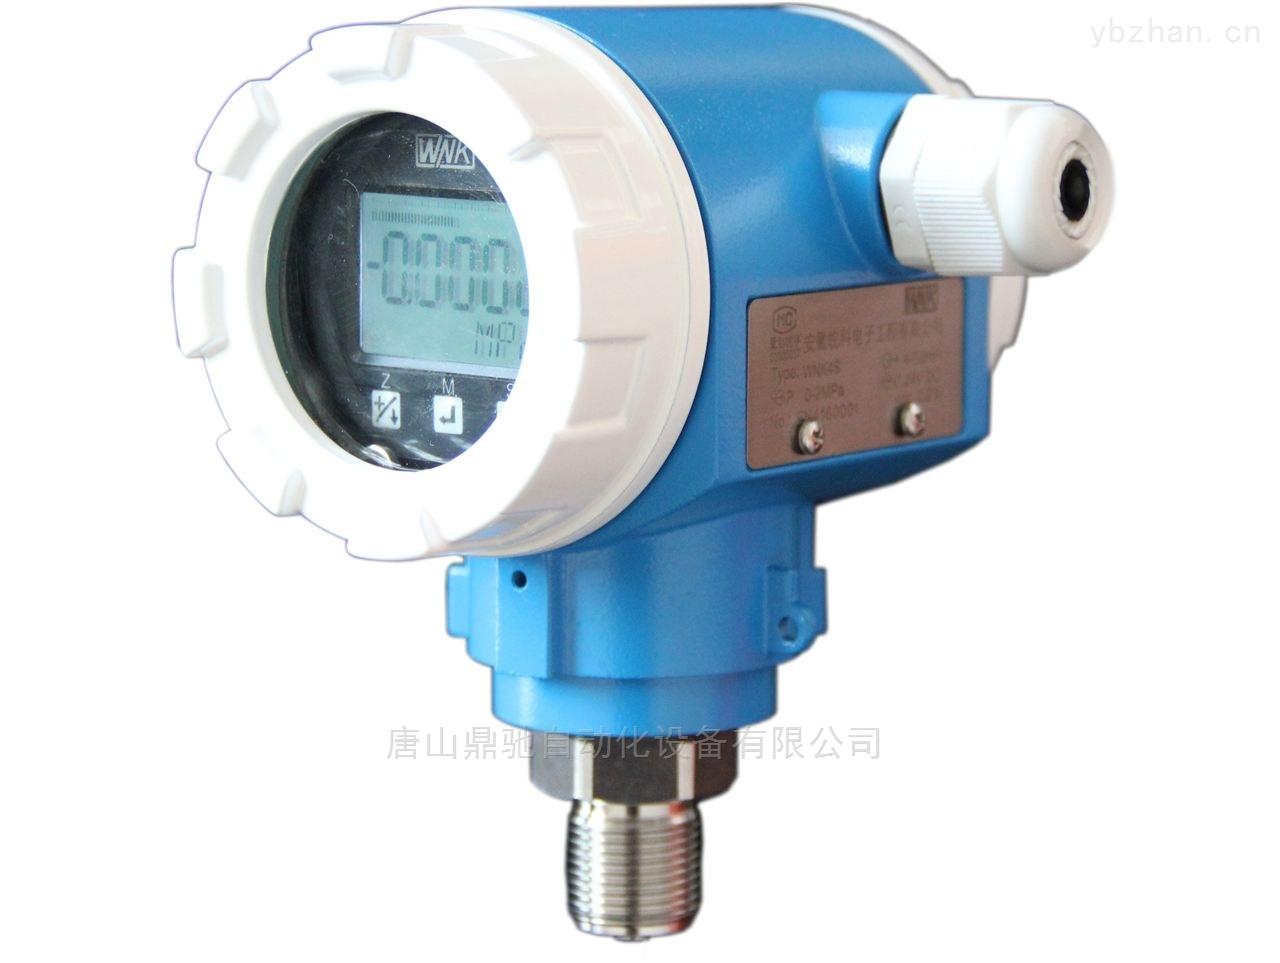 DCBP-M20*1.5接口固定螺纹液晶可设置压力变送器